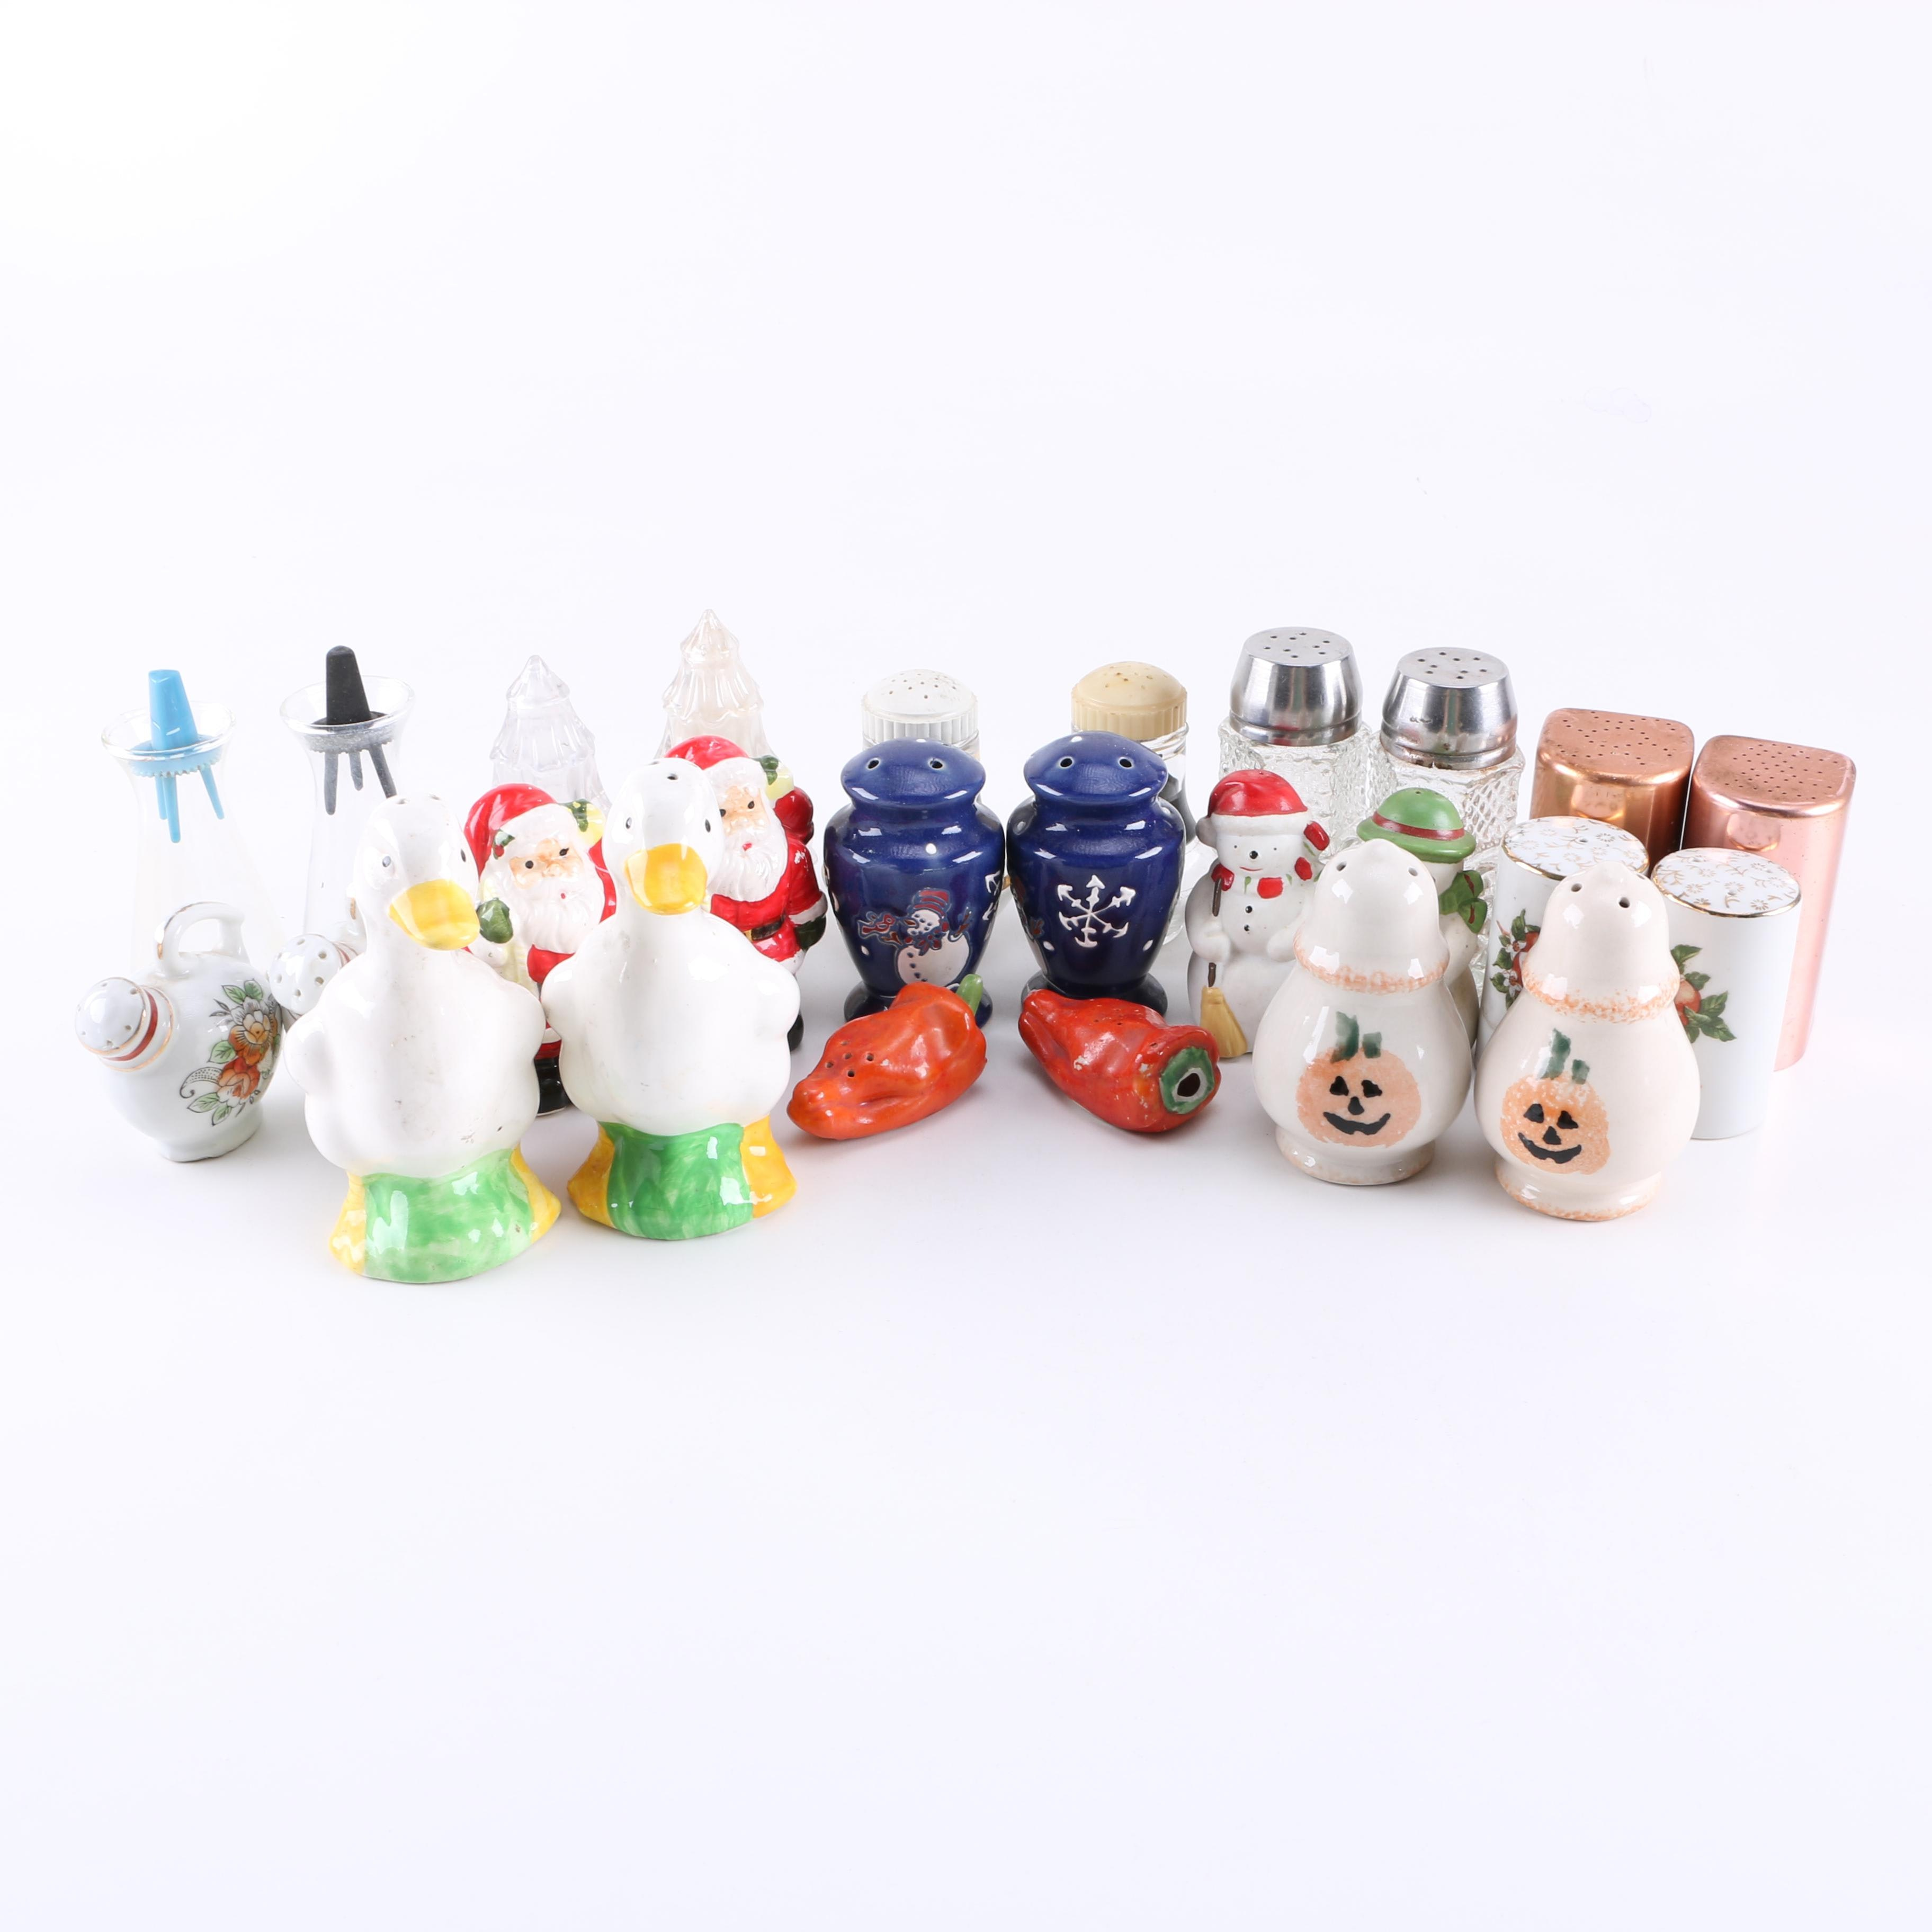 Salt and Pepper Shaker Assortment